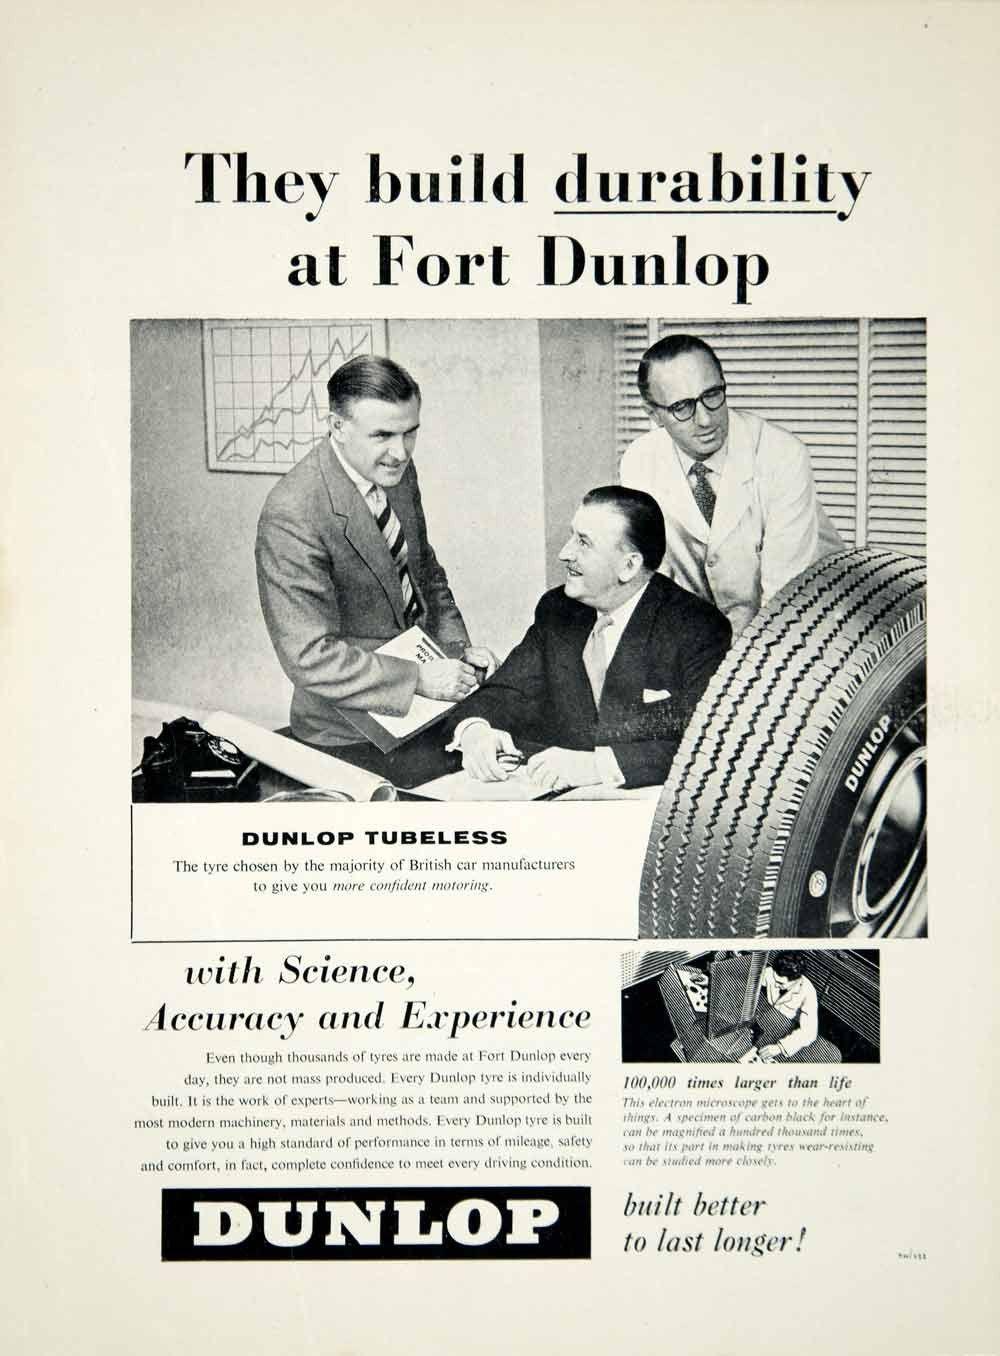 1958 Ad Dunlop Tubeless Tyre Tire Car Automobile Part Garage Transportation YMT2